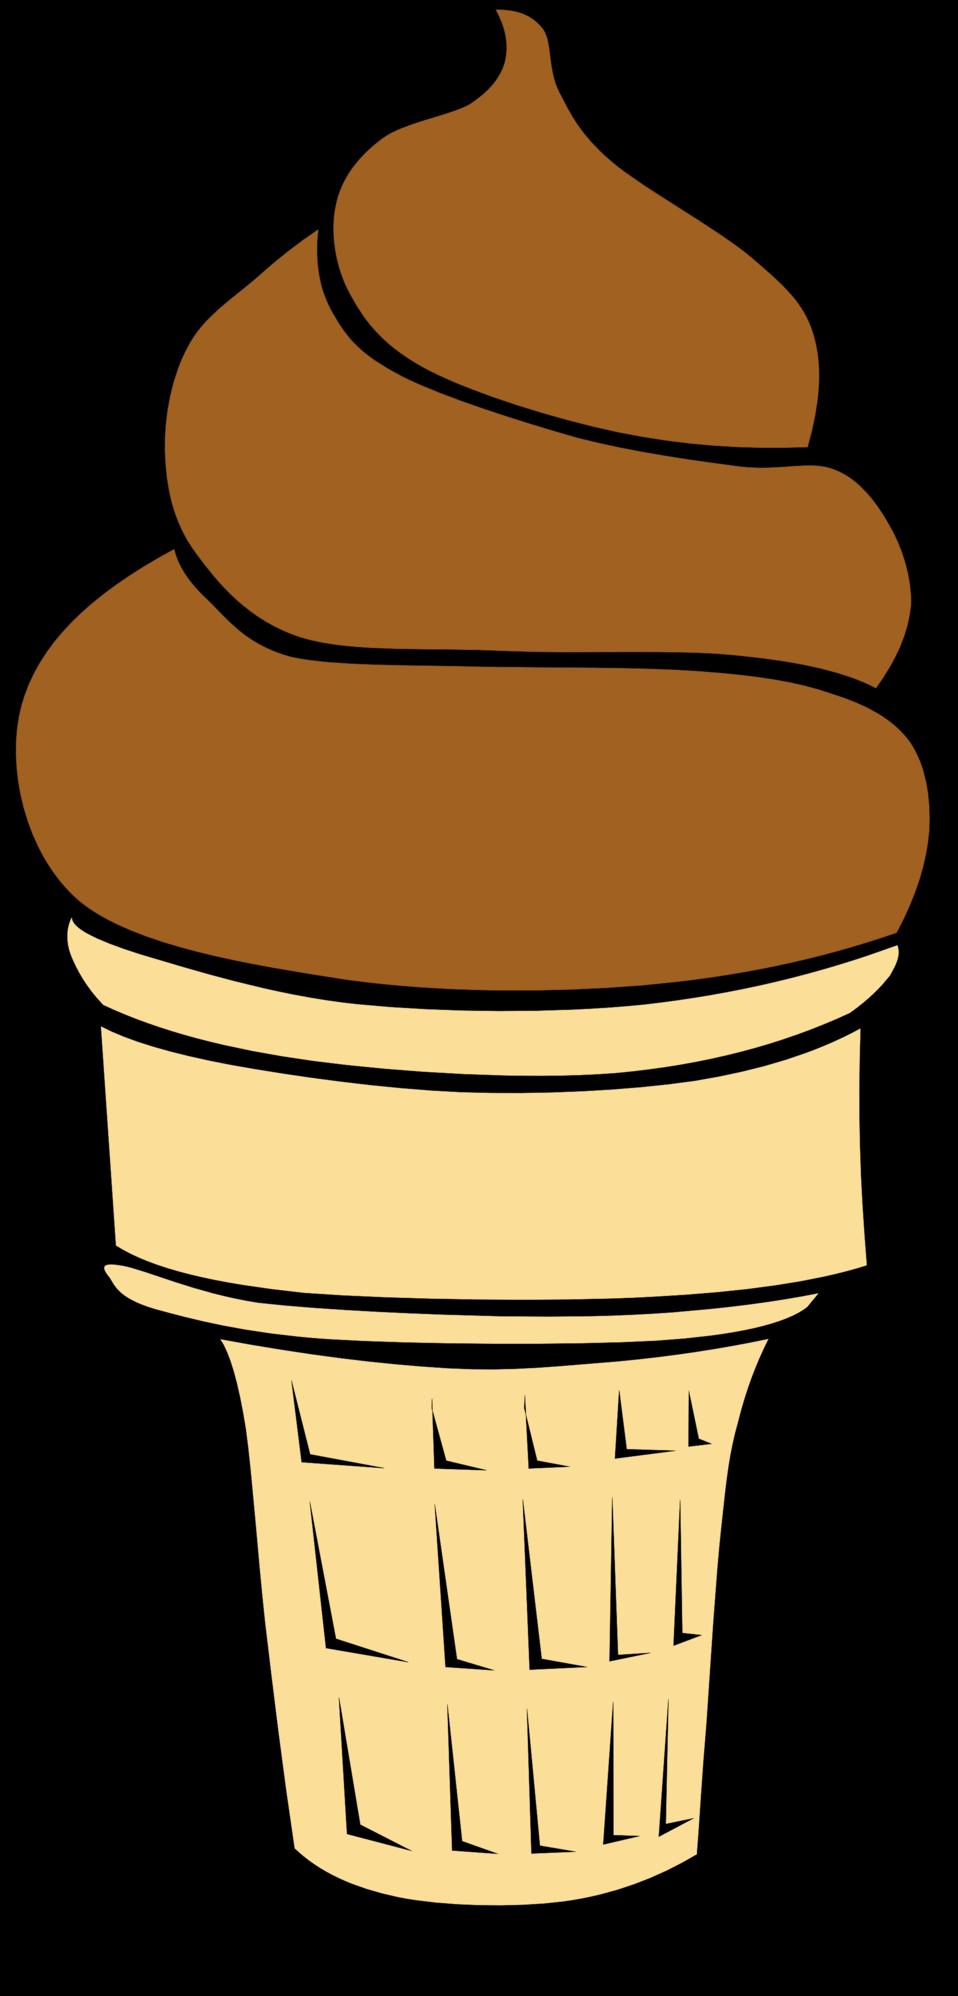 desserts clipart dessert menu